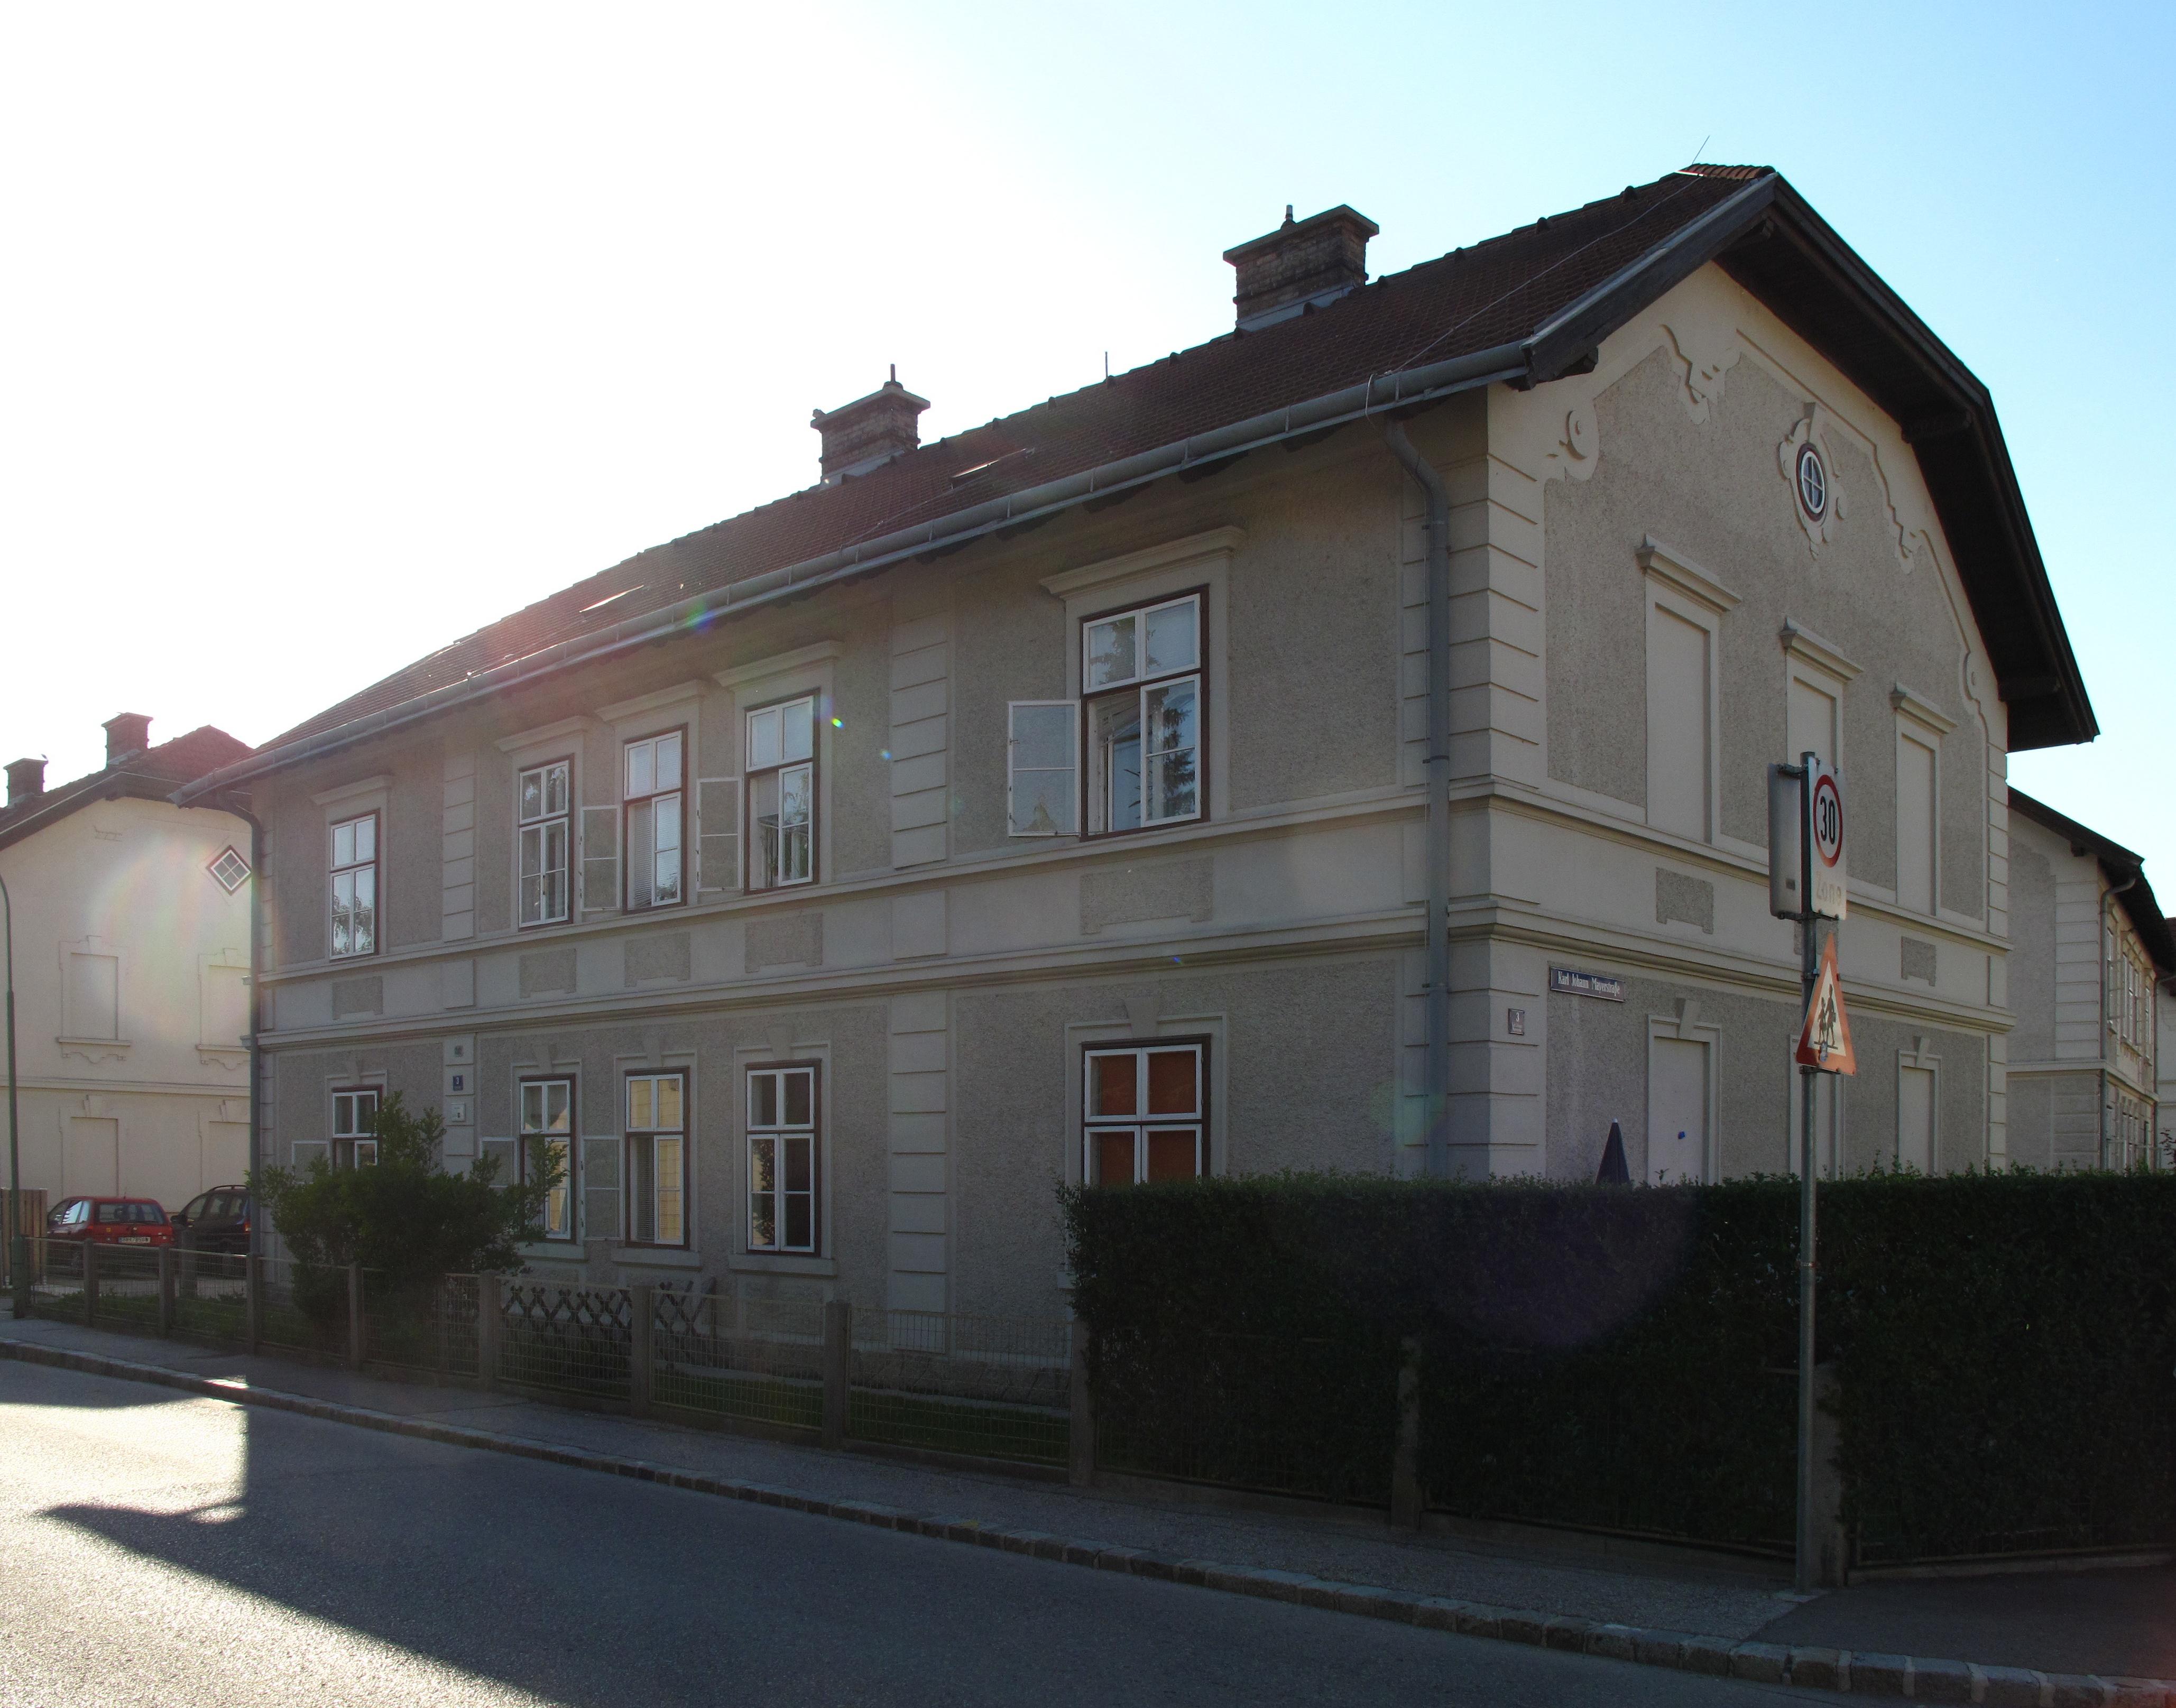 Dating girls online in Berndorf bei Salzburg. Meet a girl in